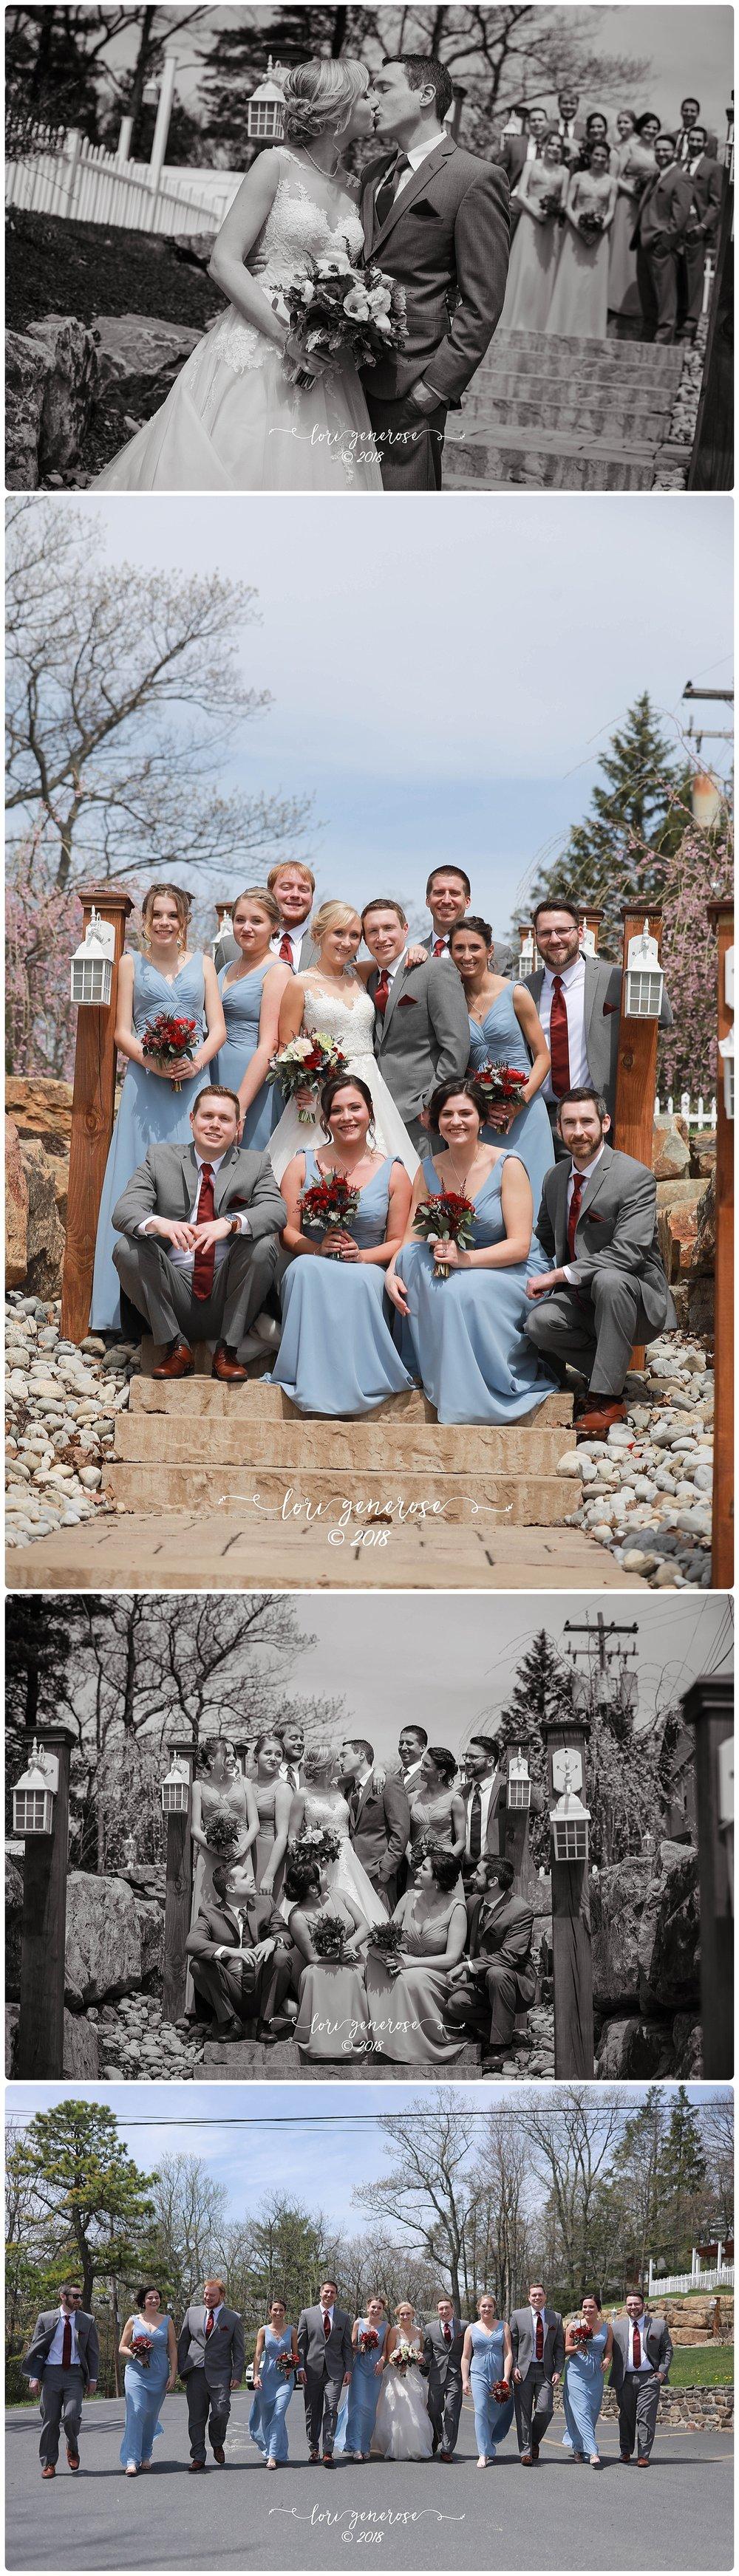 lgphotographylorigenerosetheinnatpoconomanorpaweddingvenuebridalparty.jpg